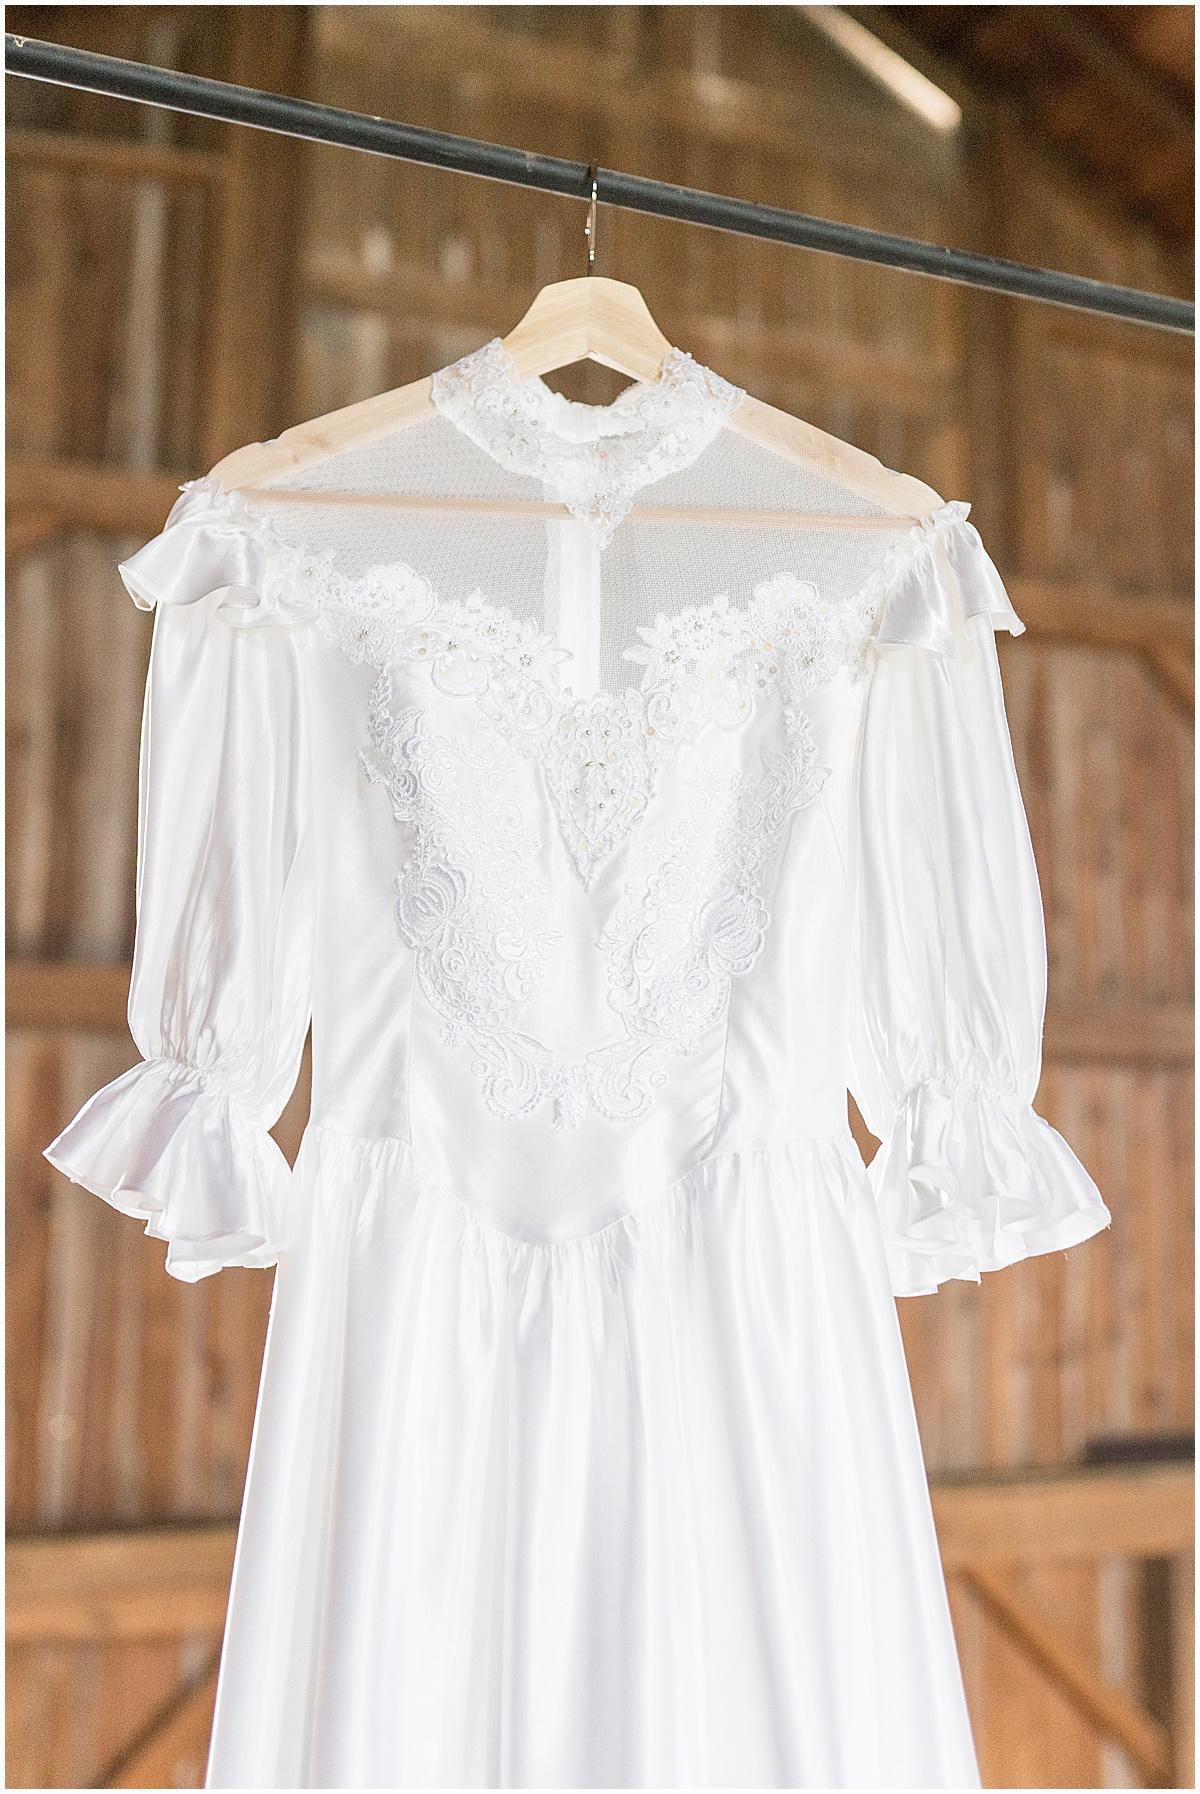 Vintage wedding dress at Exploration Acres wedding in Lafayette, Indiana